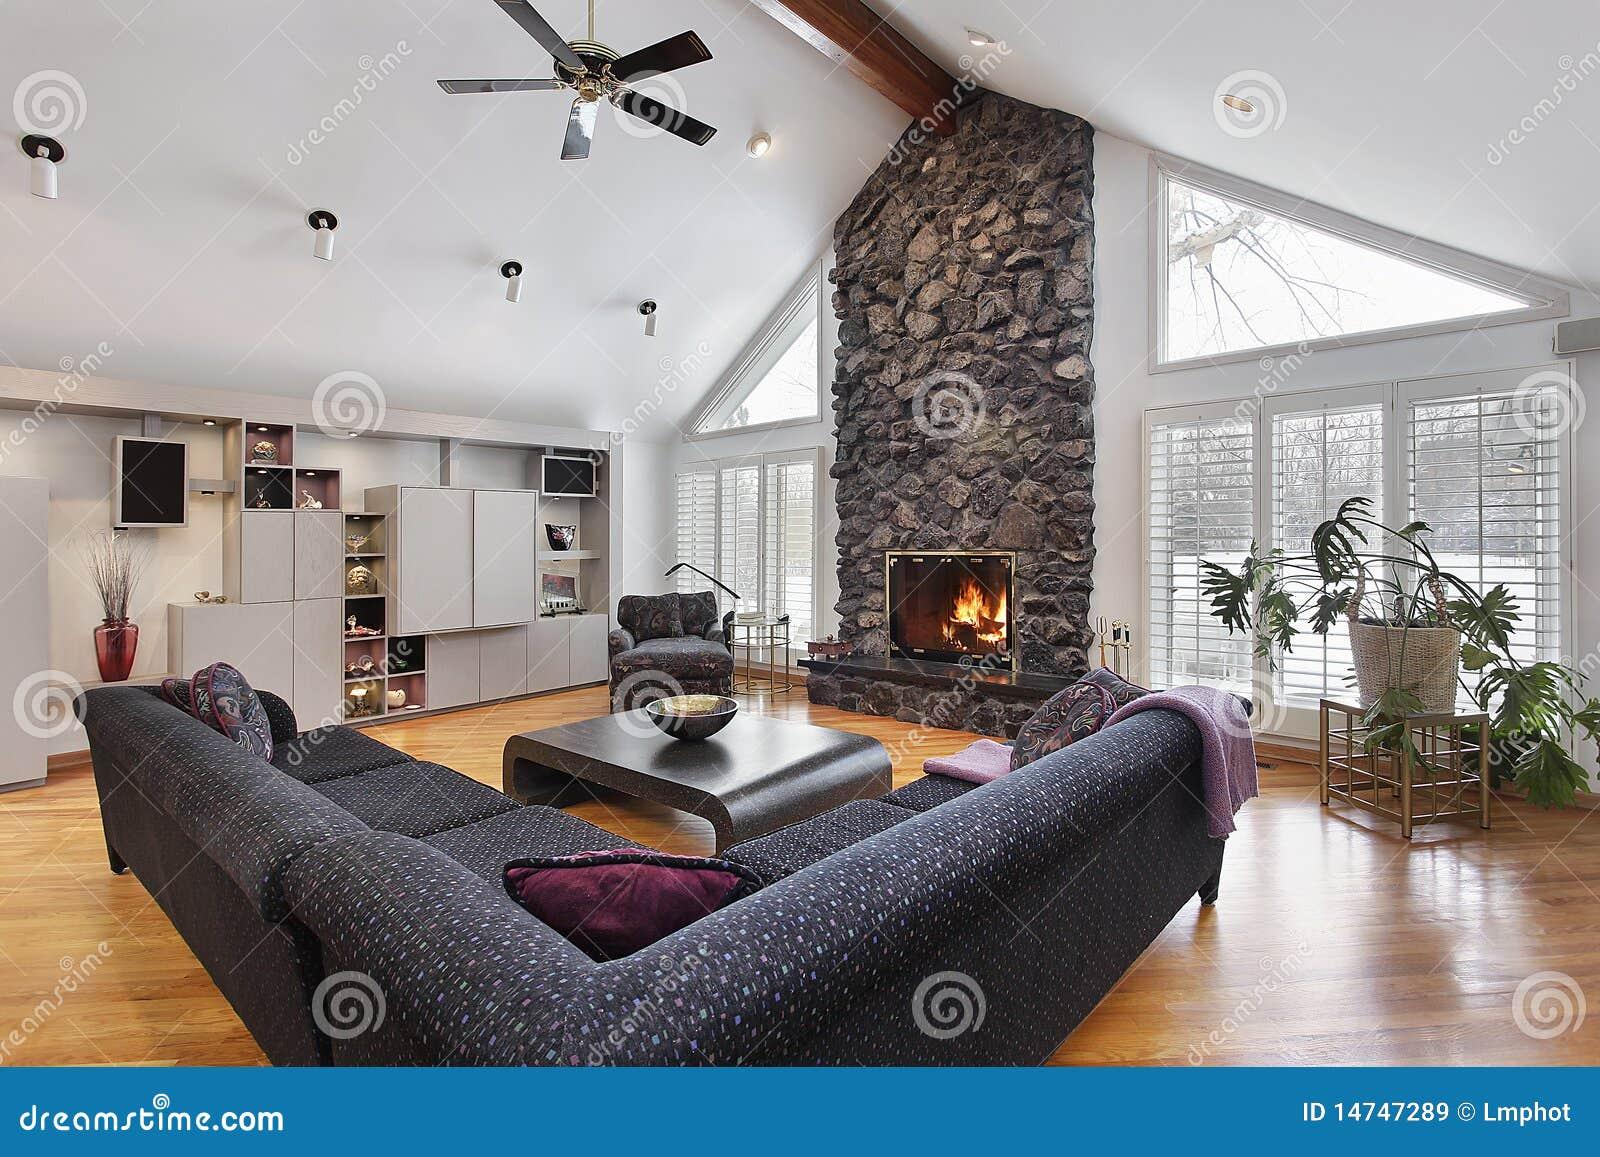 Family room with two story stone fireplace stock image - Chimenea de piedra ...